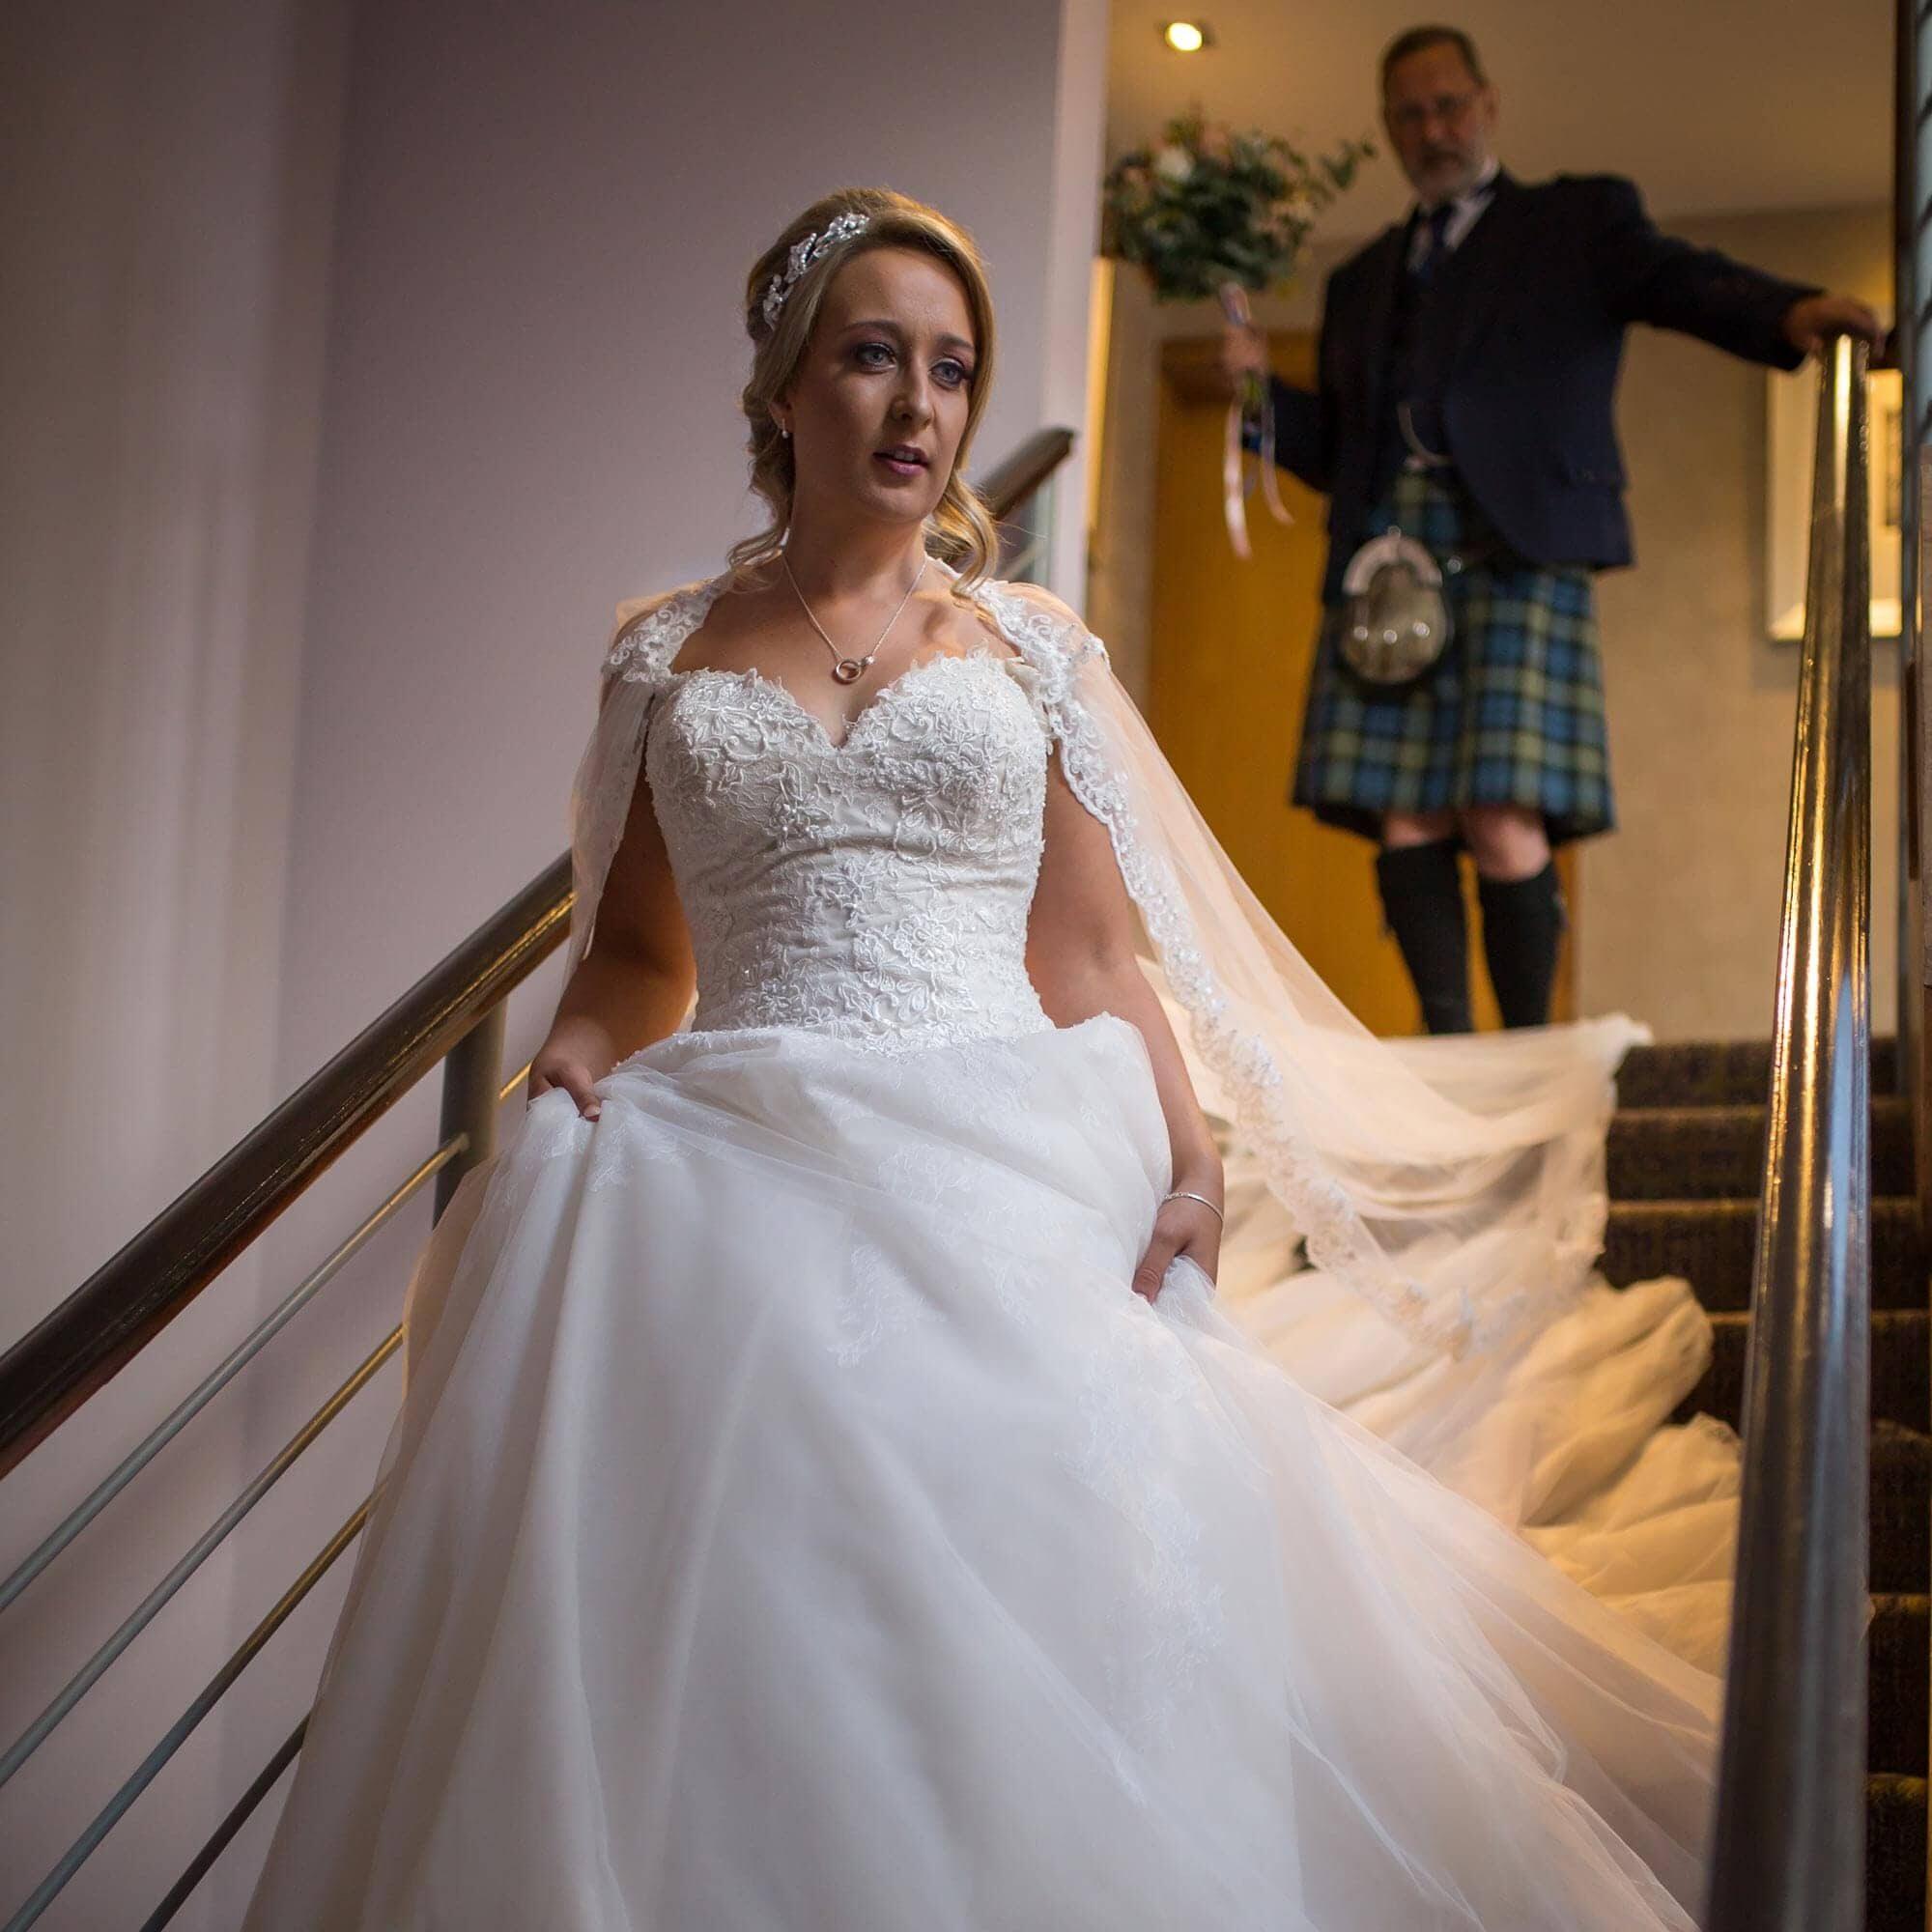 Bride walking down stairs with dad behind her